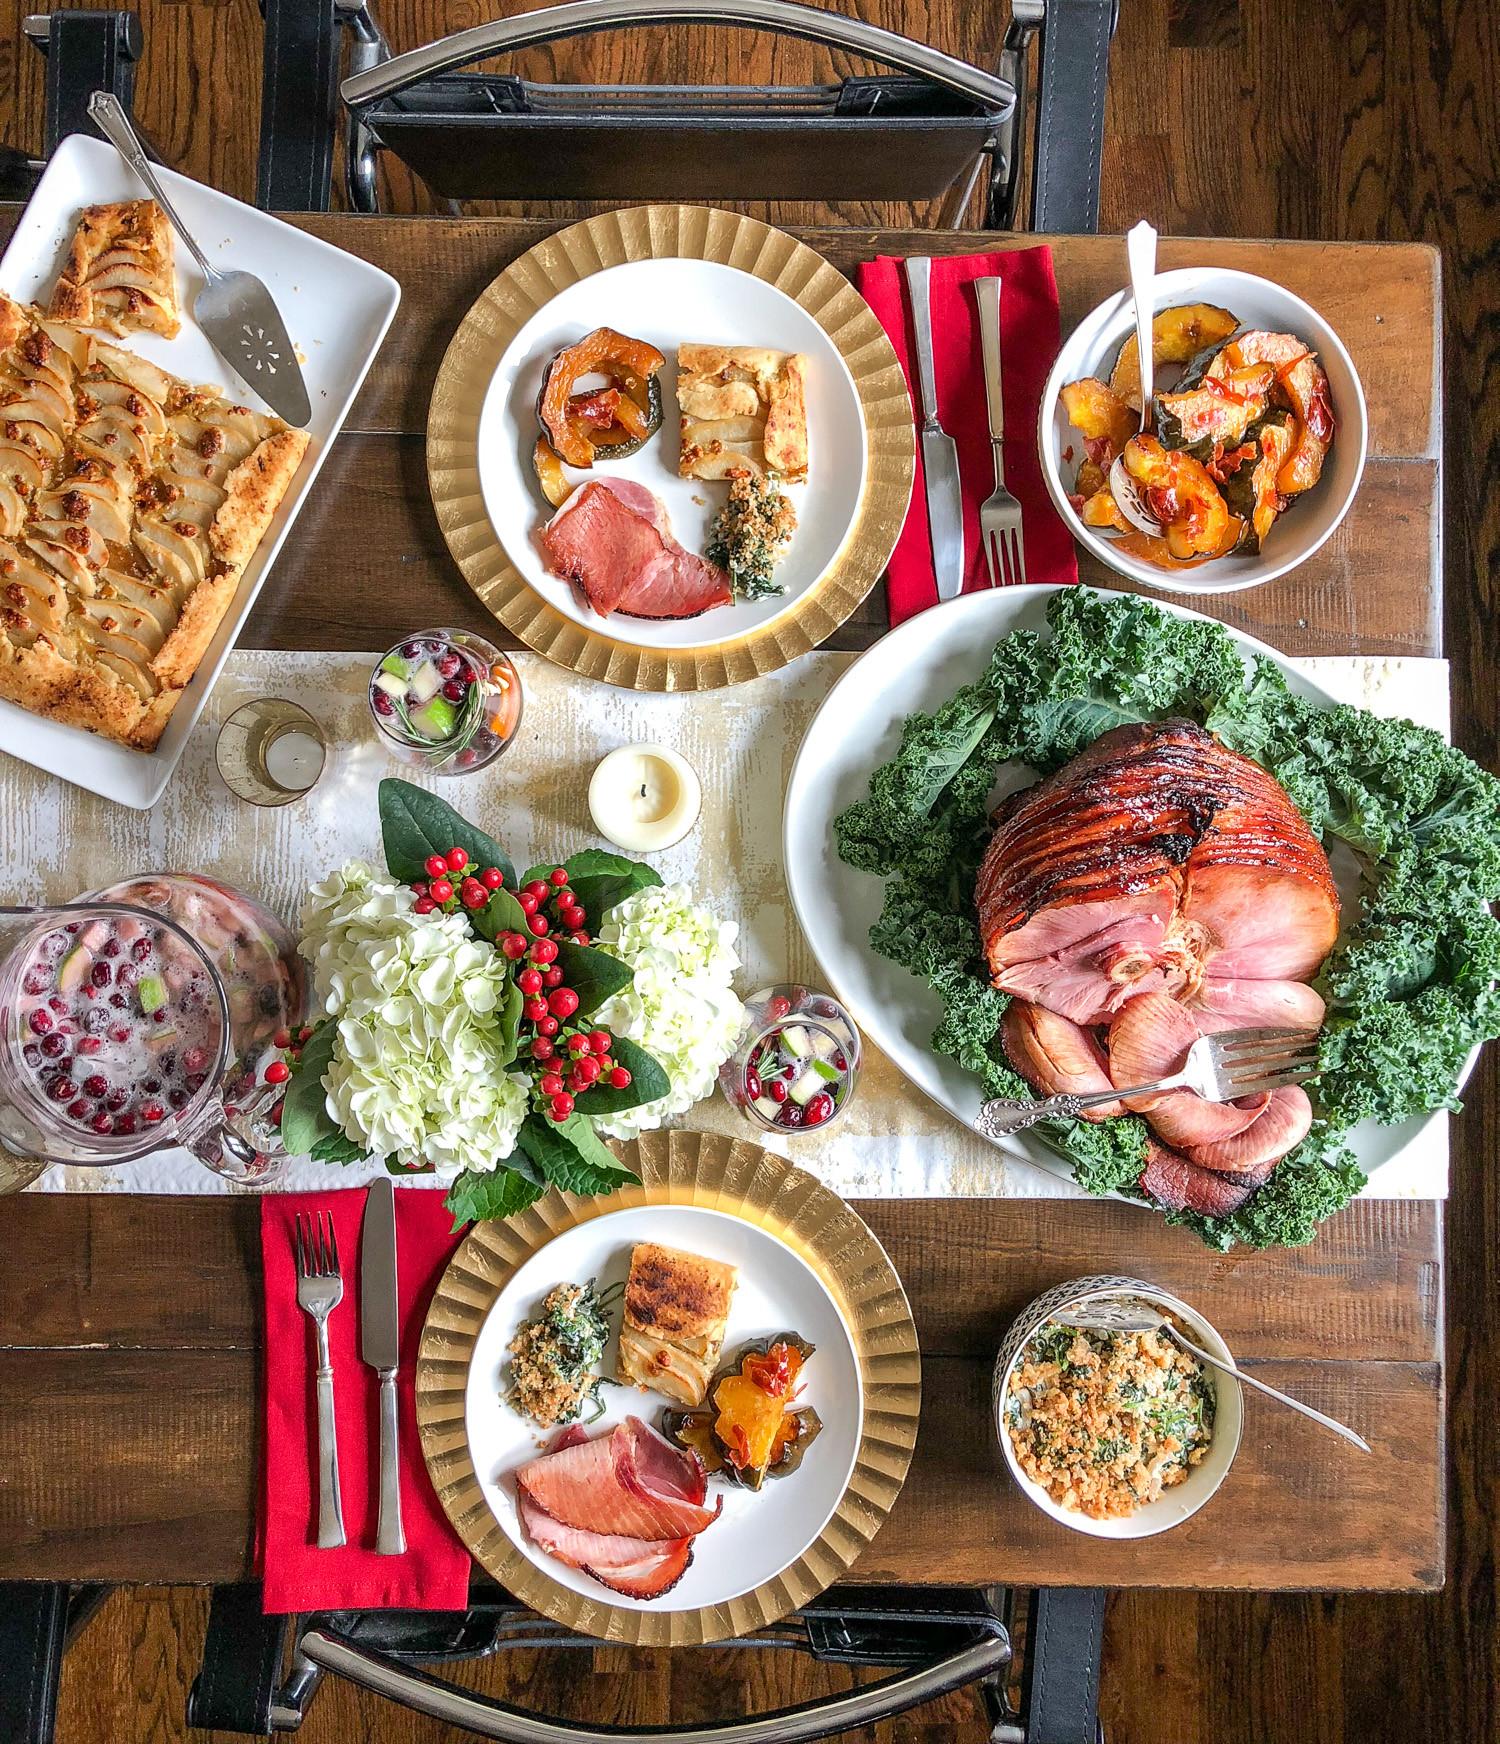 Christmas Dinner Ideas 2017  Christmas Dinner Menu Ideas Plan a Memorable Meal for